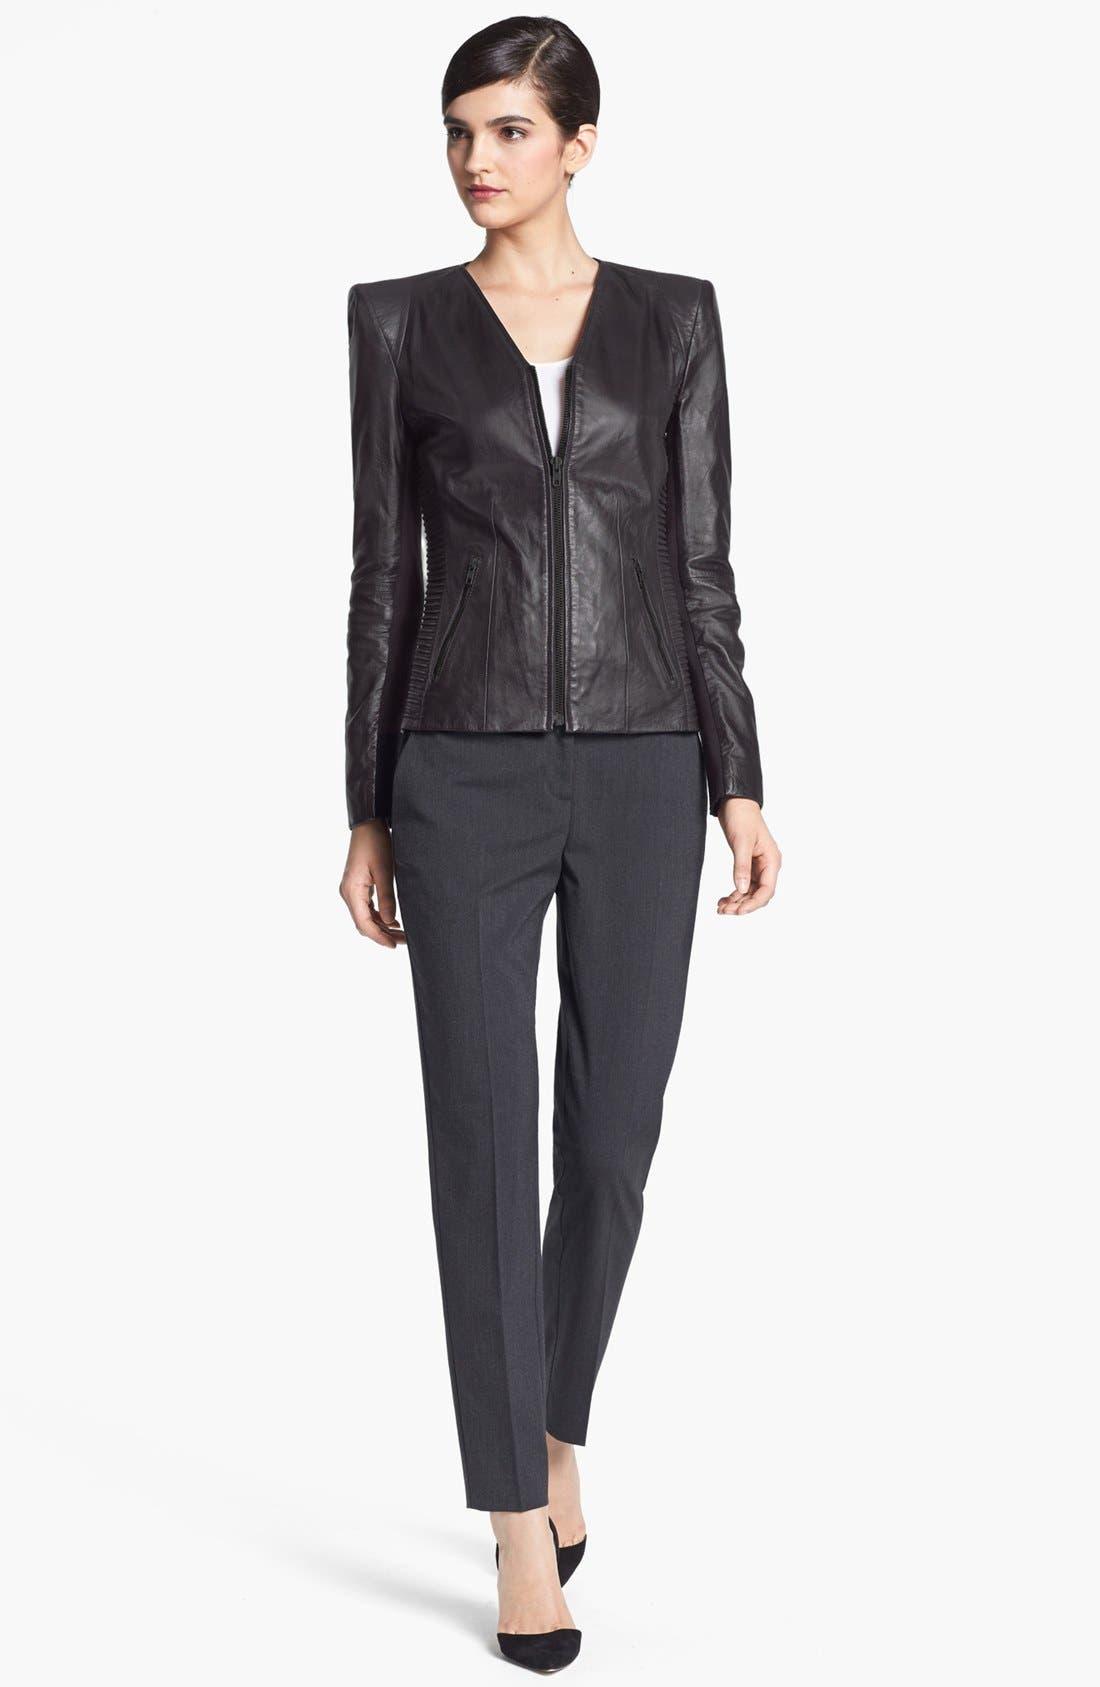 Alternate Image 1 Selected - Trouvé Power Shoulder Leather Jacket